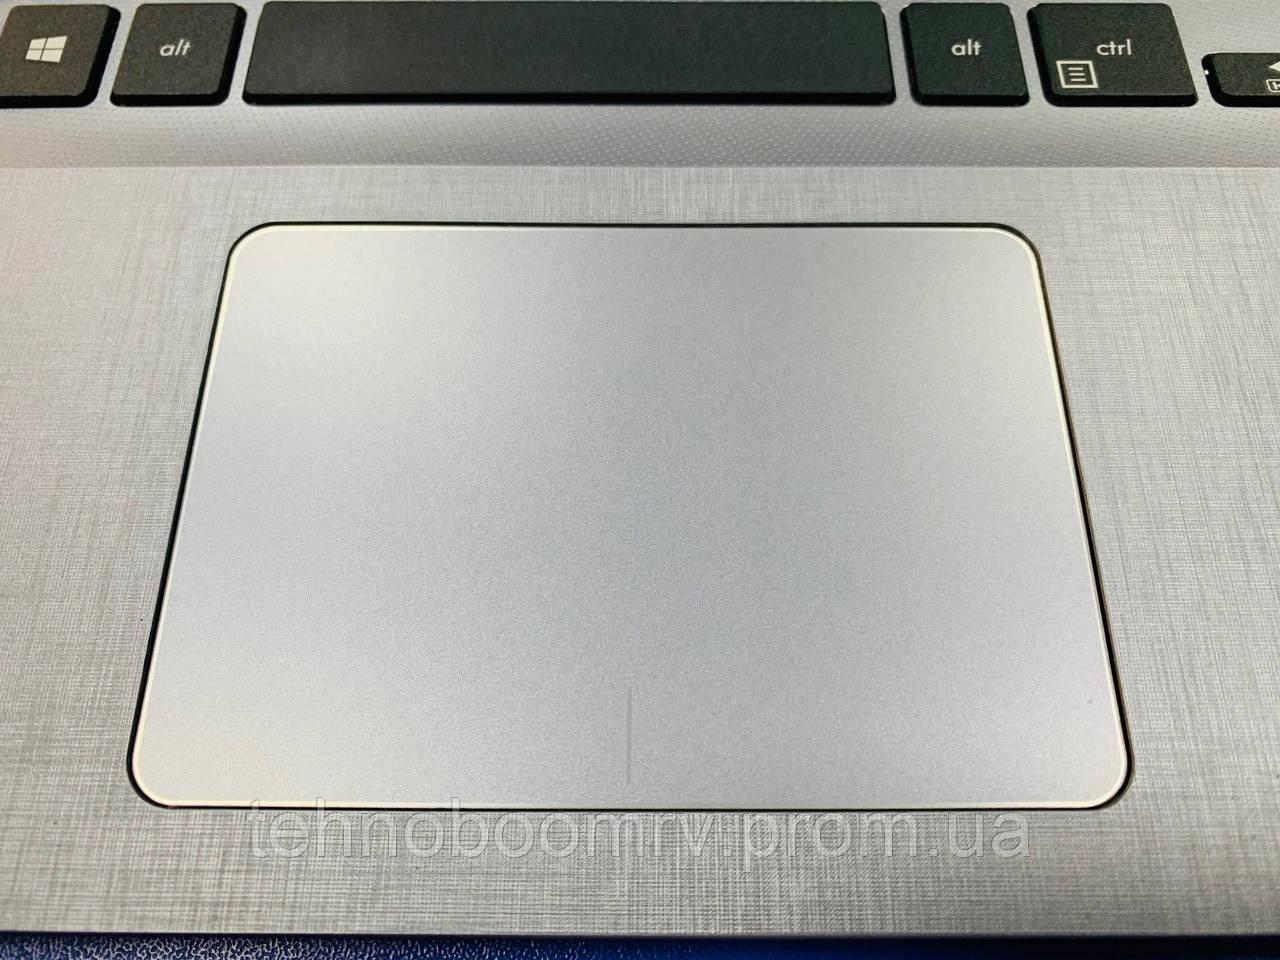 Слимовый Asus/FHD/Intel i3-7020U 2.3GHz/DDR4 8GB/SSD 256GBНет в наличии 3